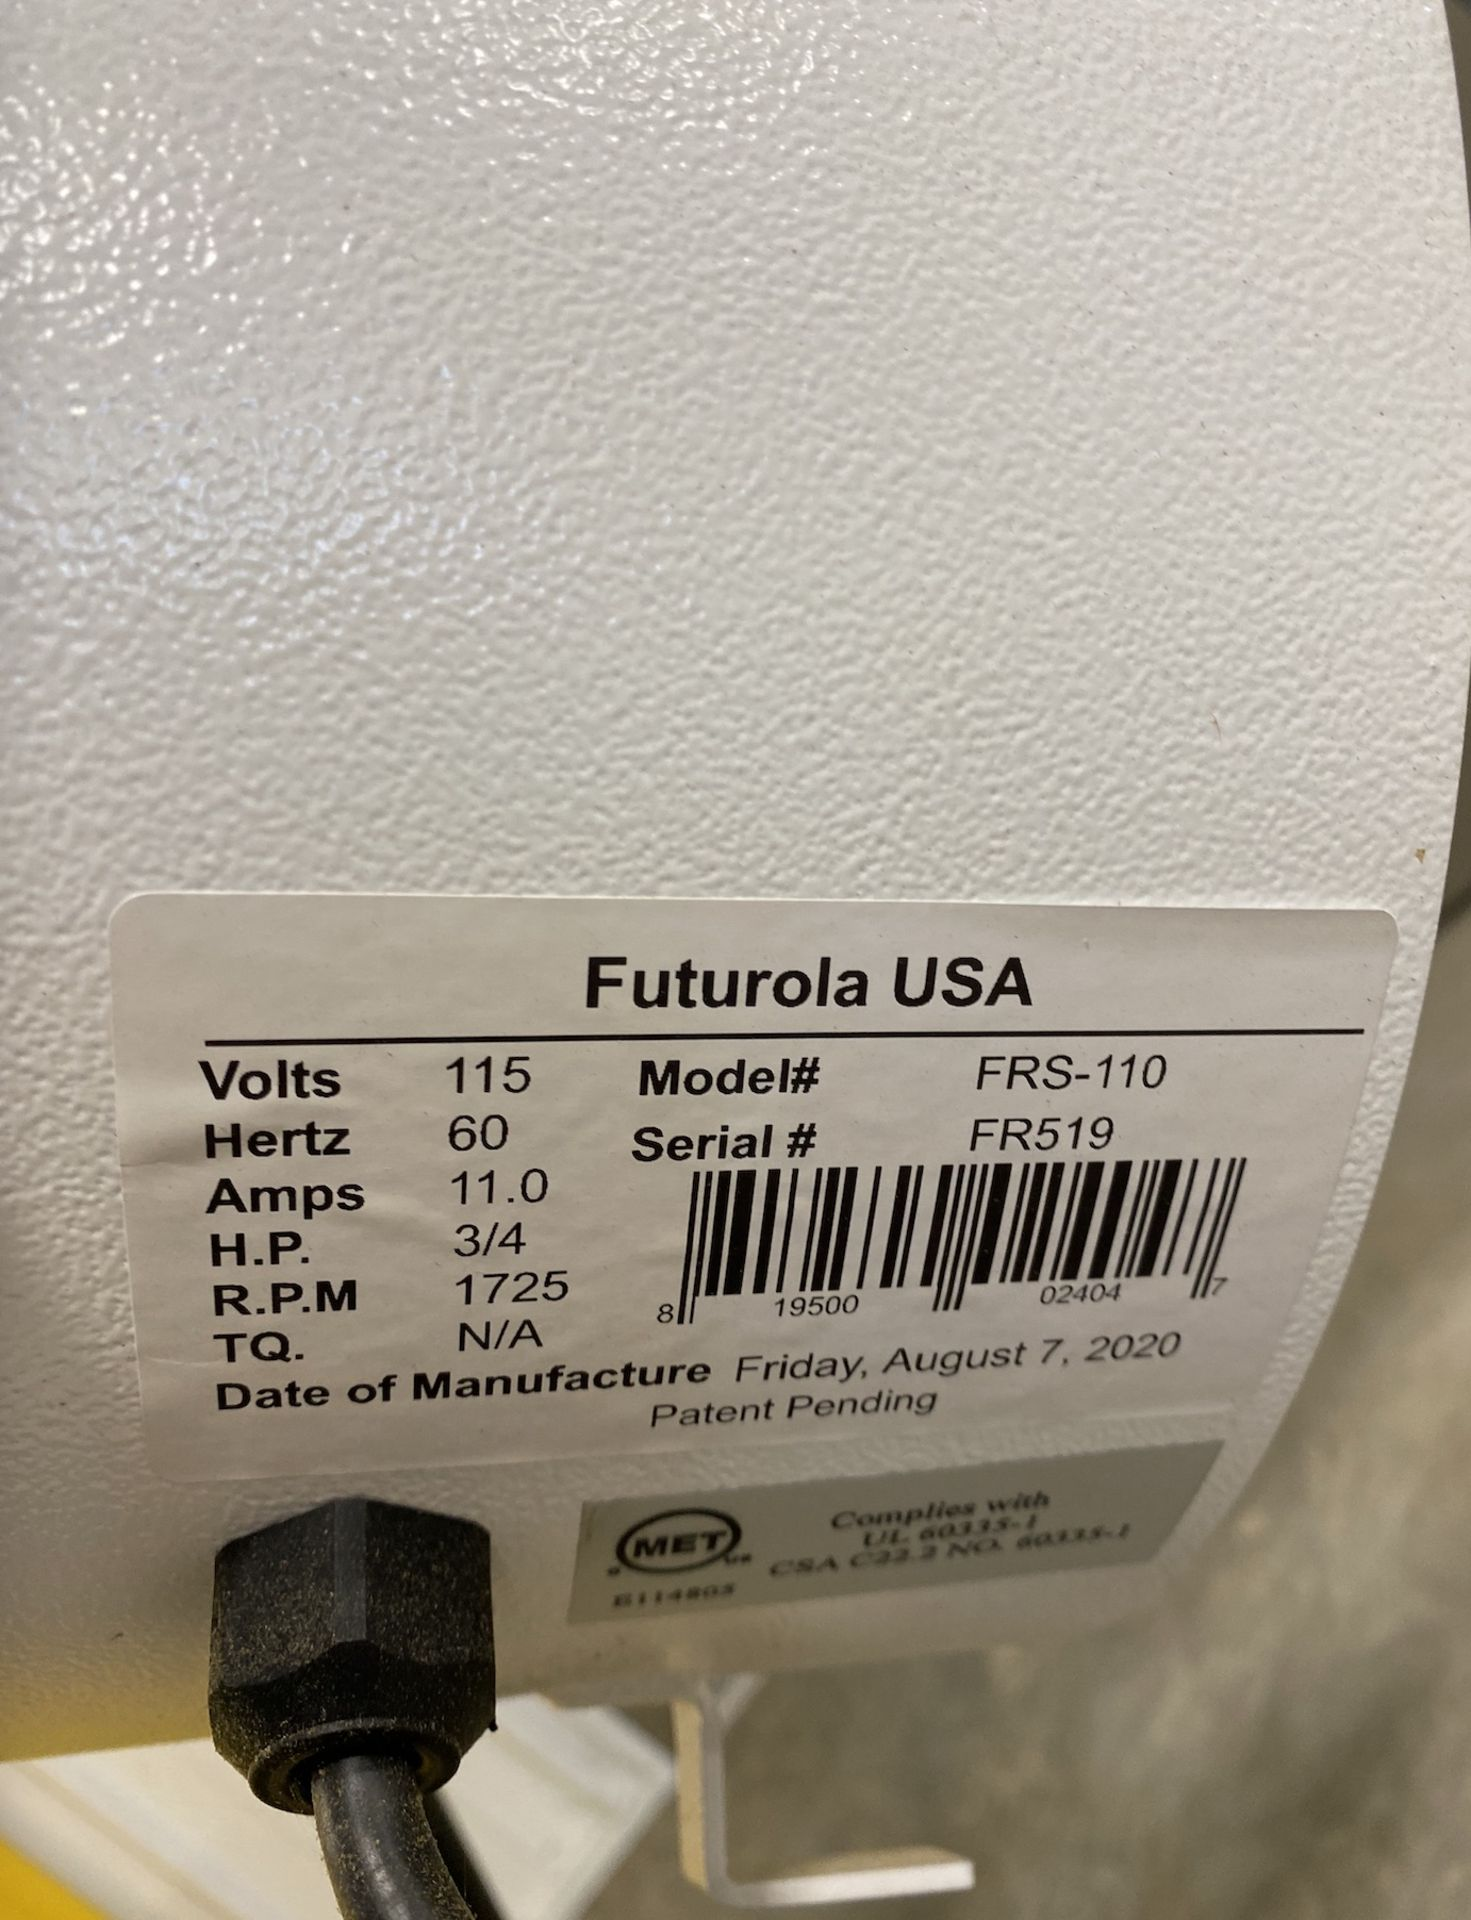 Used Futurola Original Shredder. Model FRS-110. Throughput: 0.7 lbs in 2 seconds w/ Adjustable Timer - Image 3 of 3